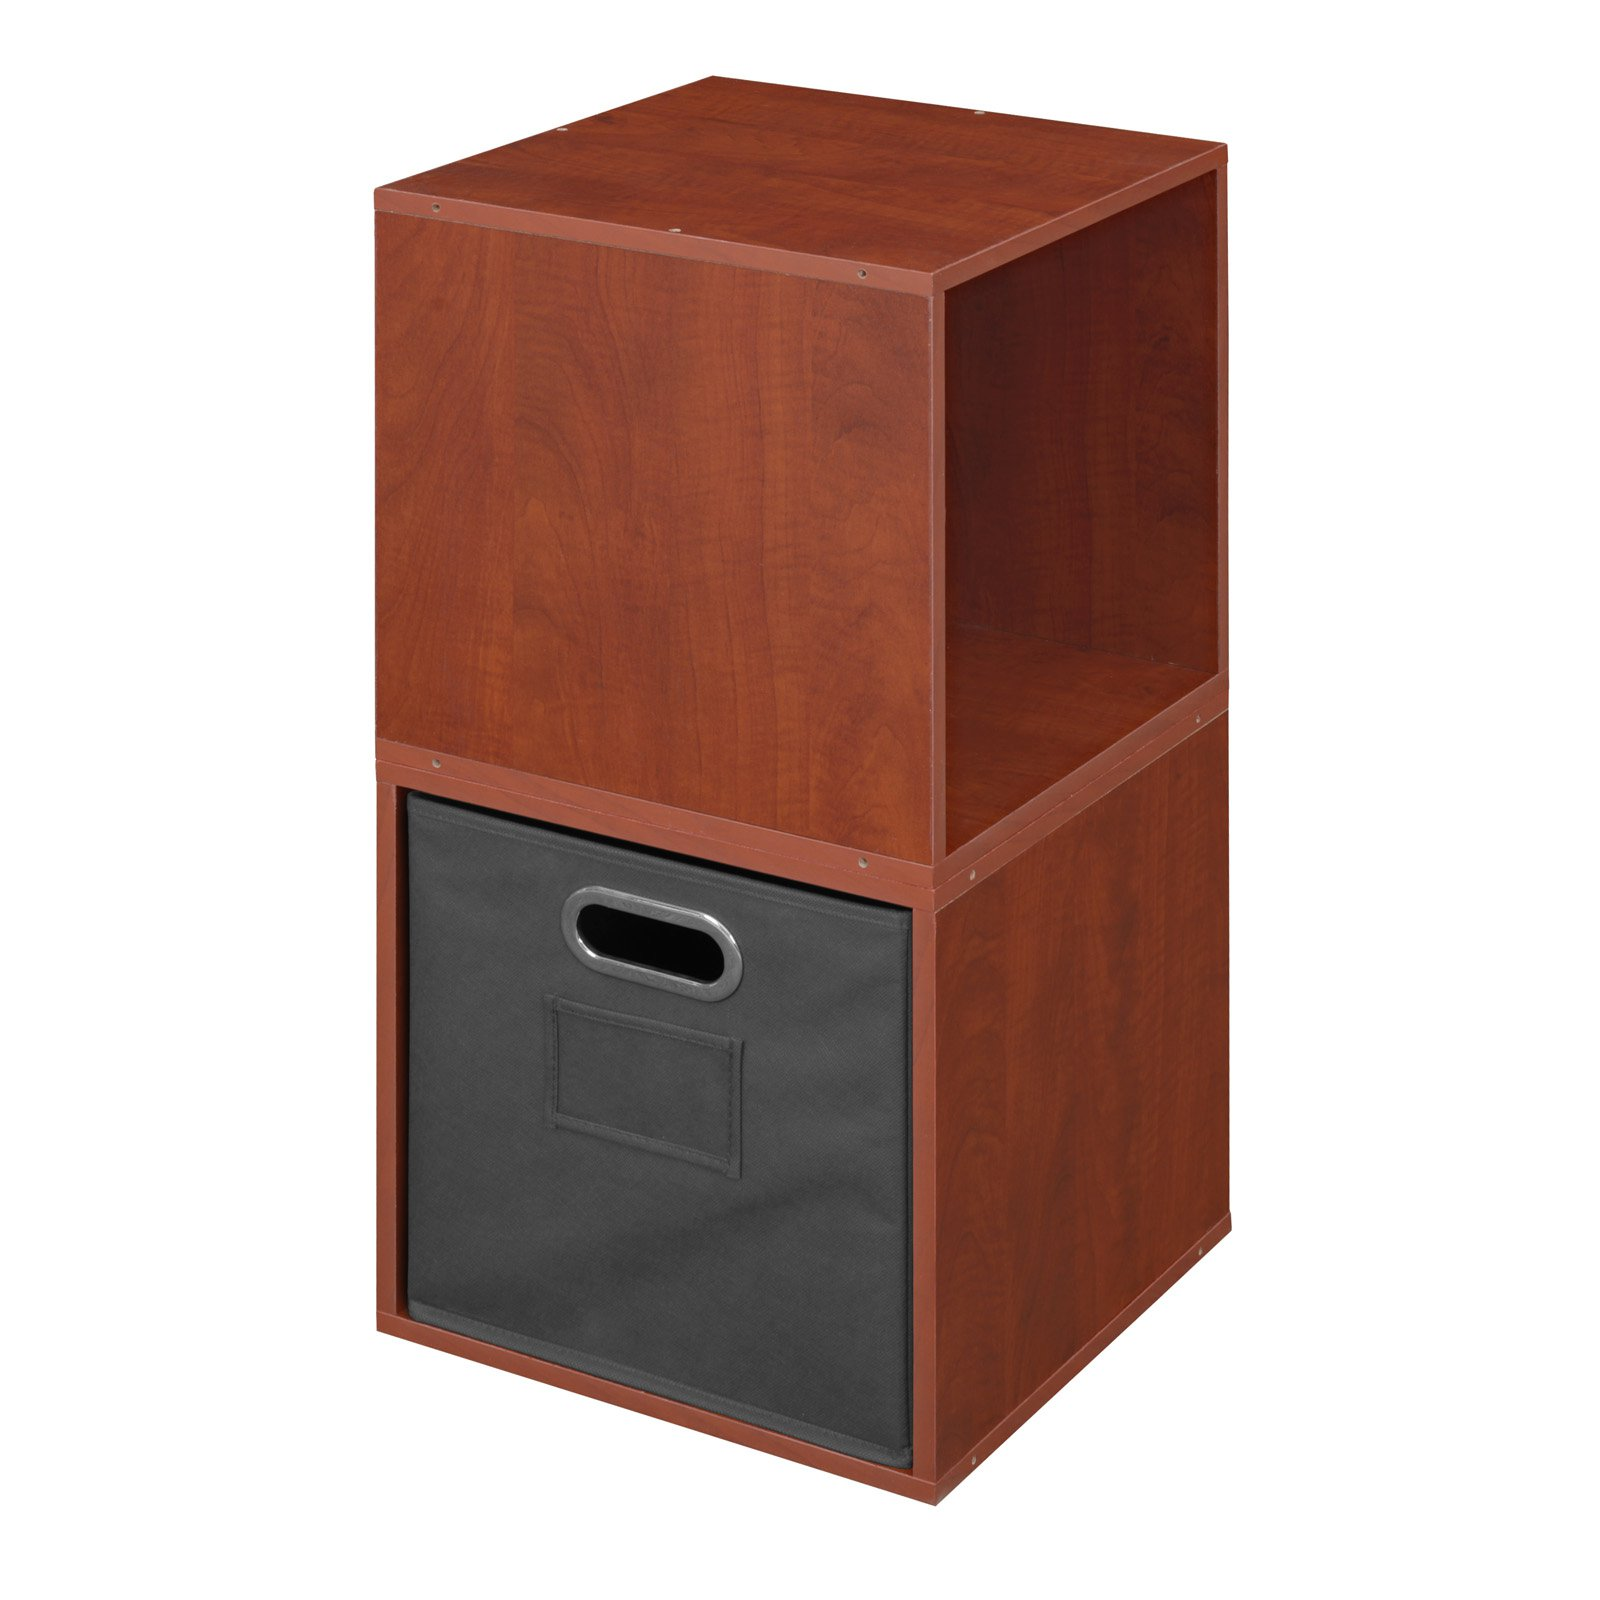 Niche Cubo Storage Set - 2 Cubes and 1 Canvas Bin